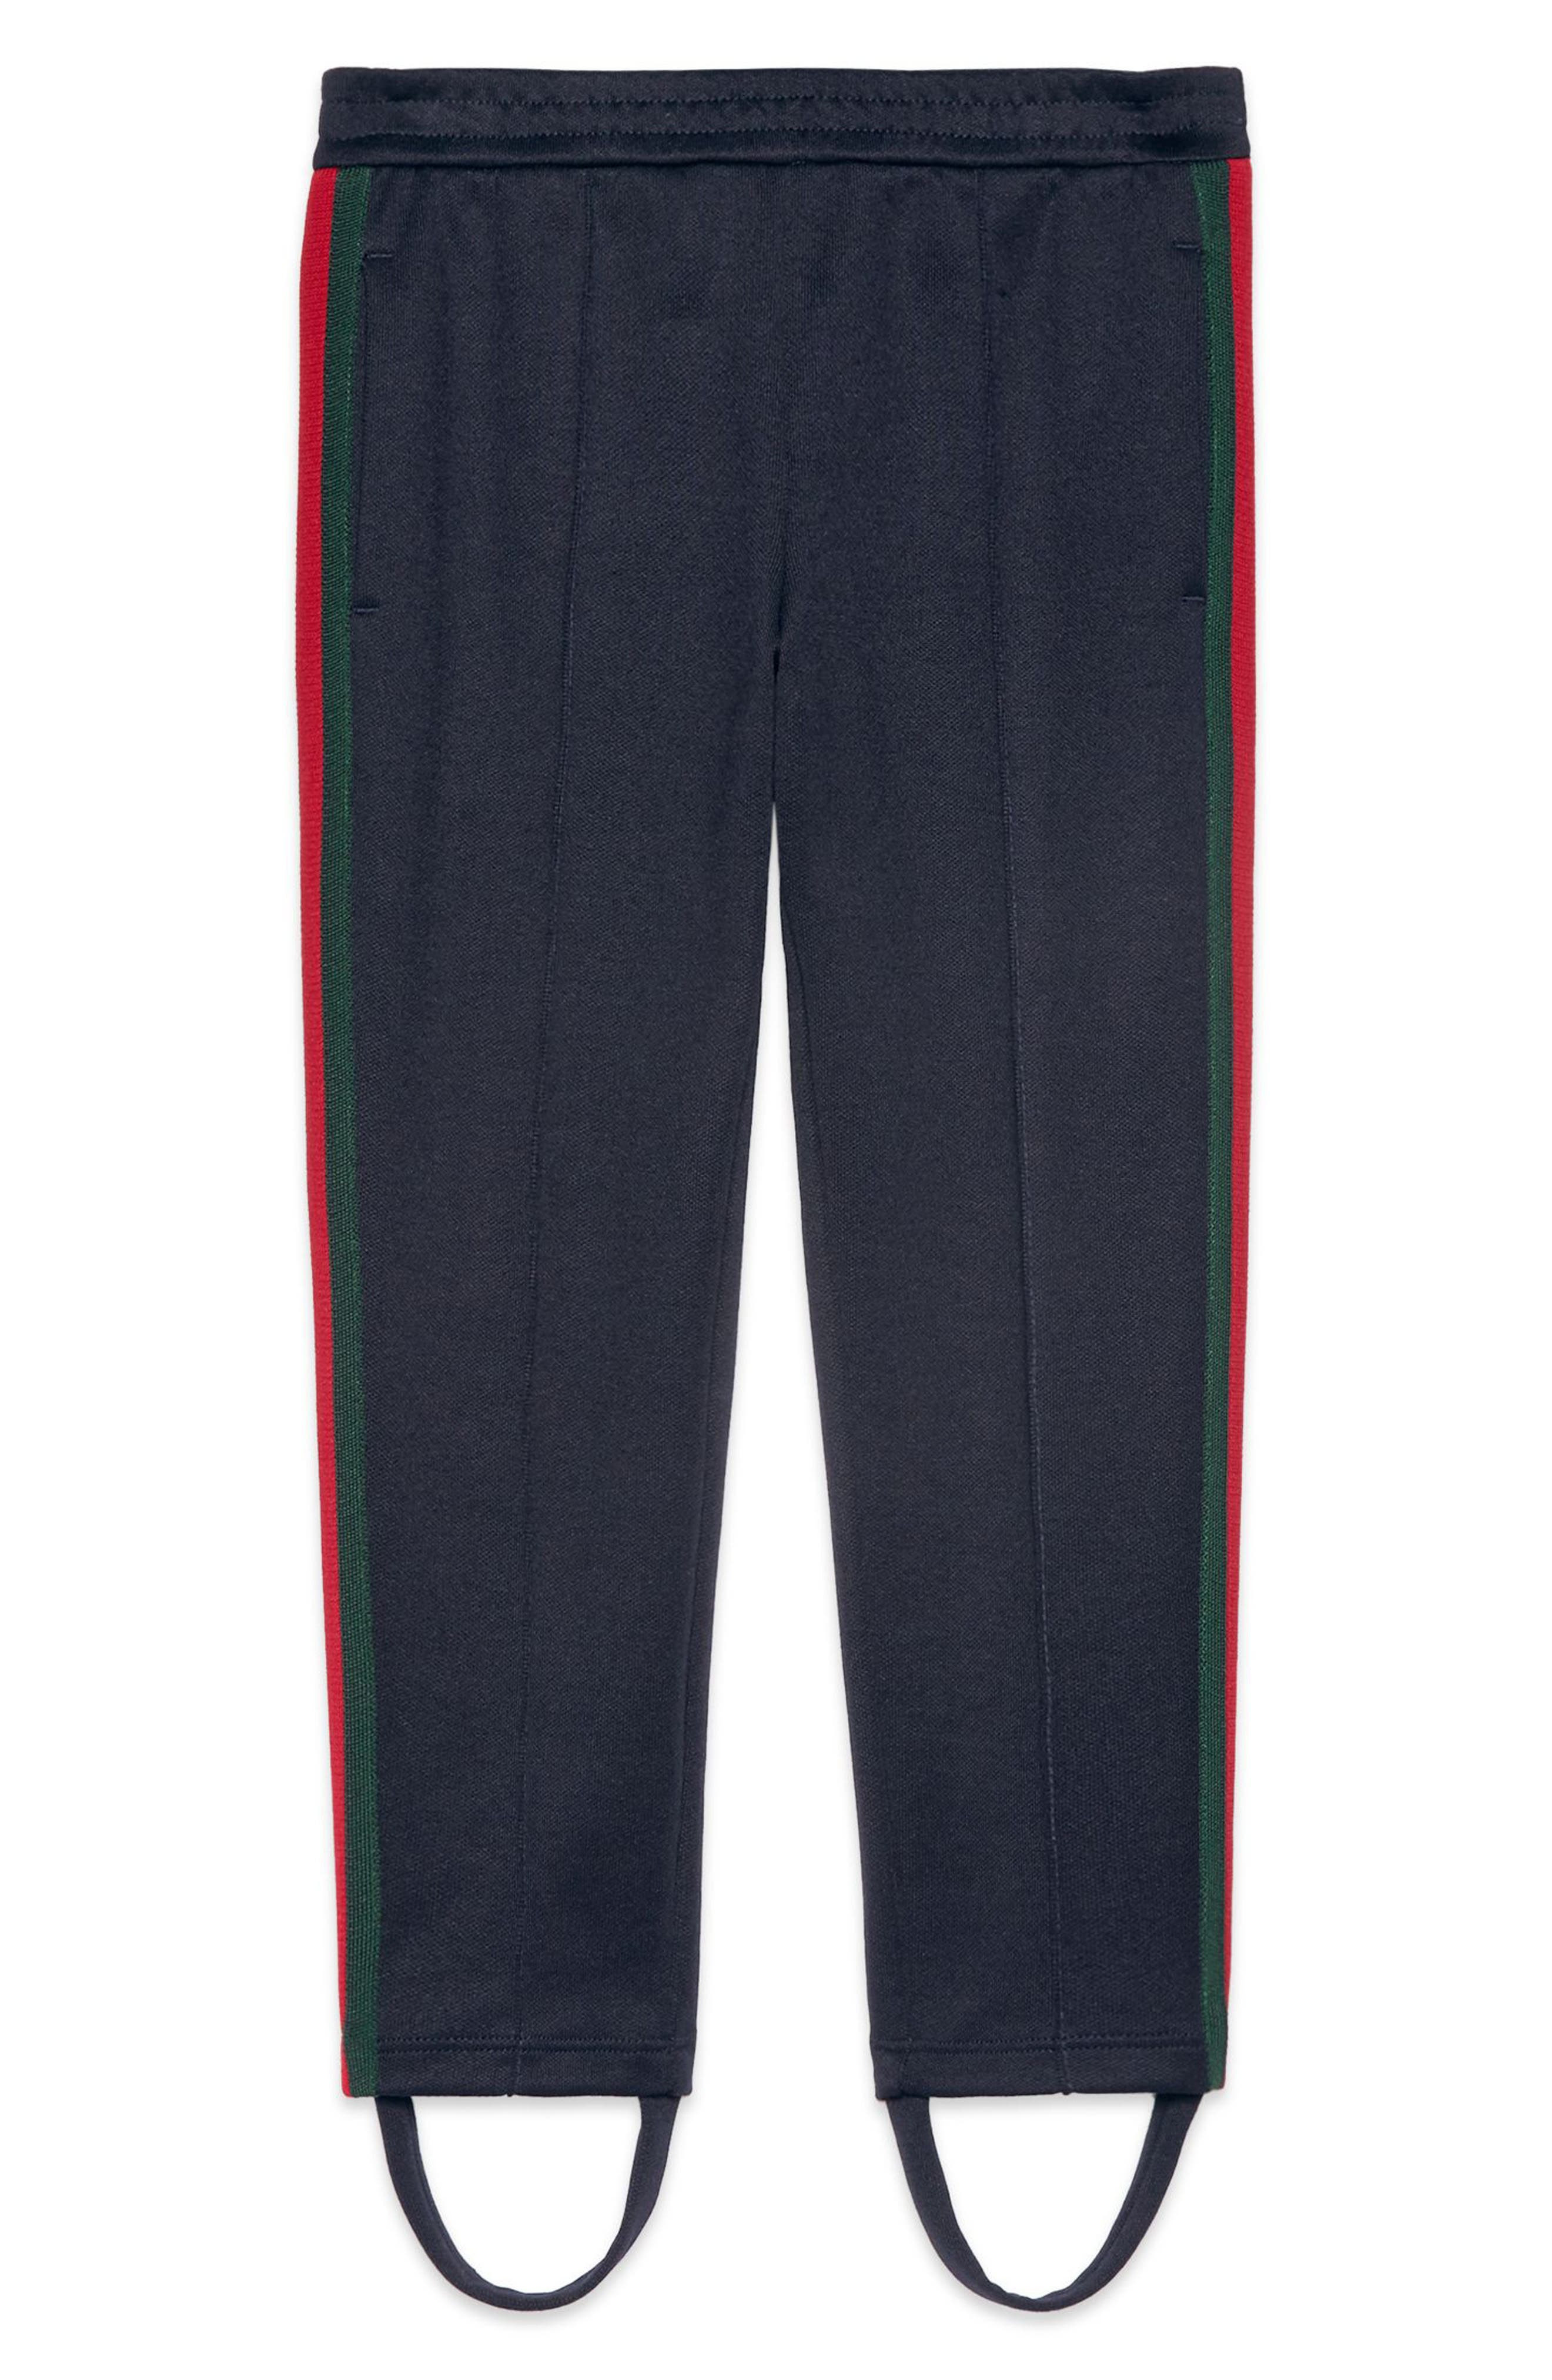 GUCCI Stripe Jersey Stirrup Pants